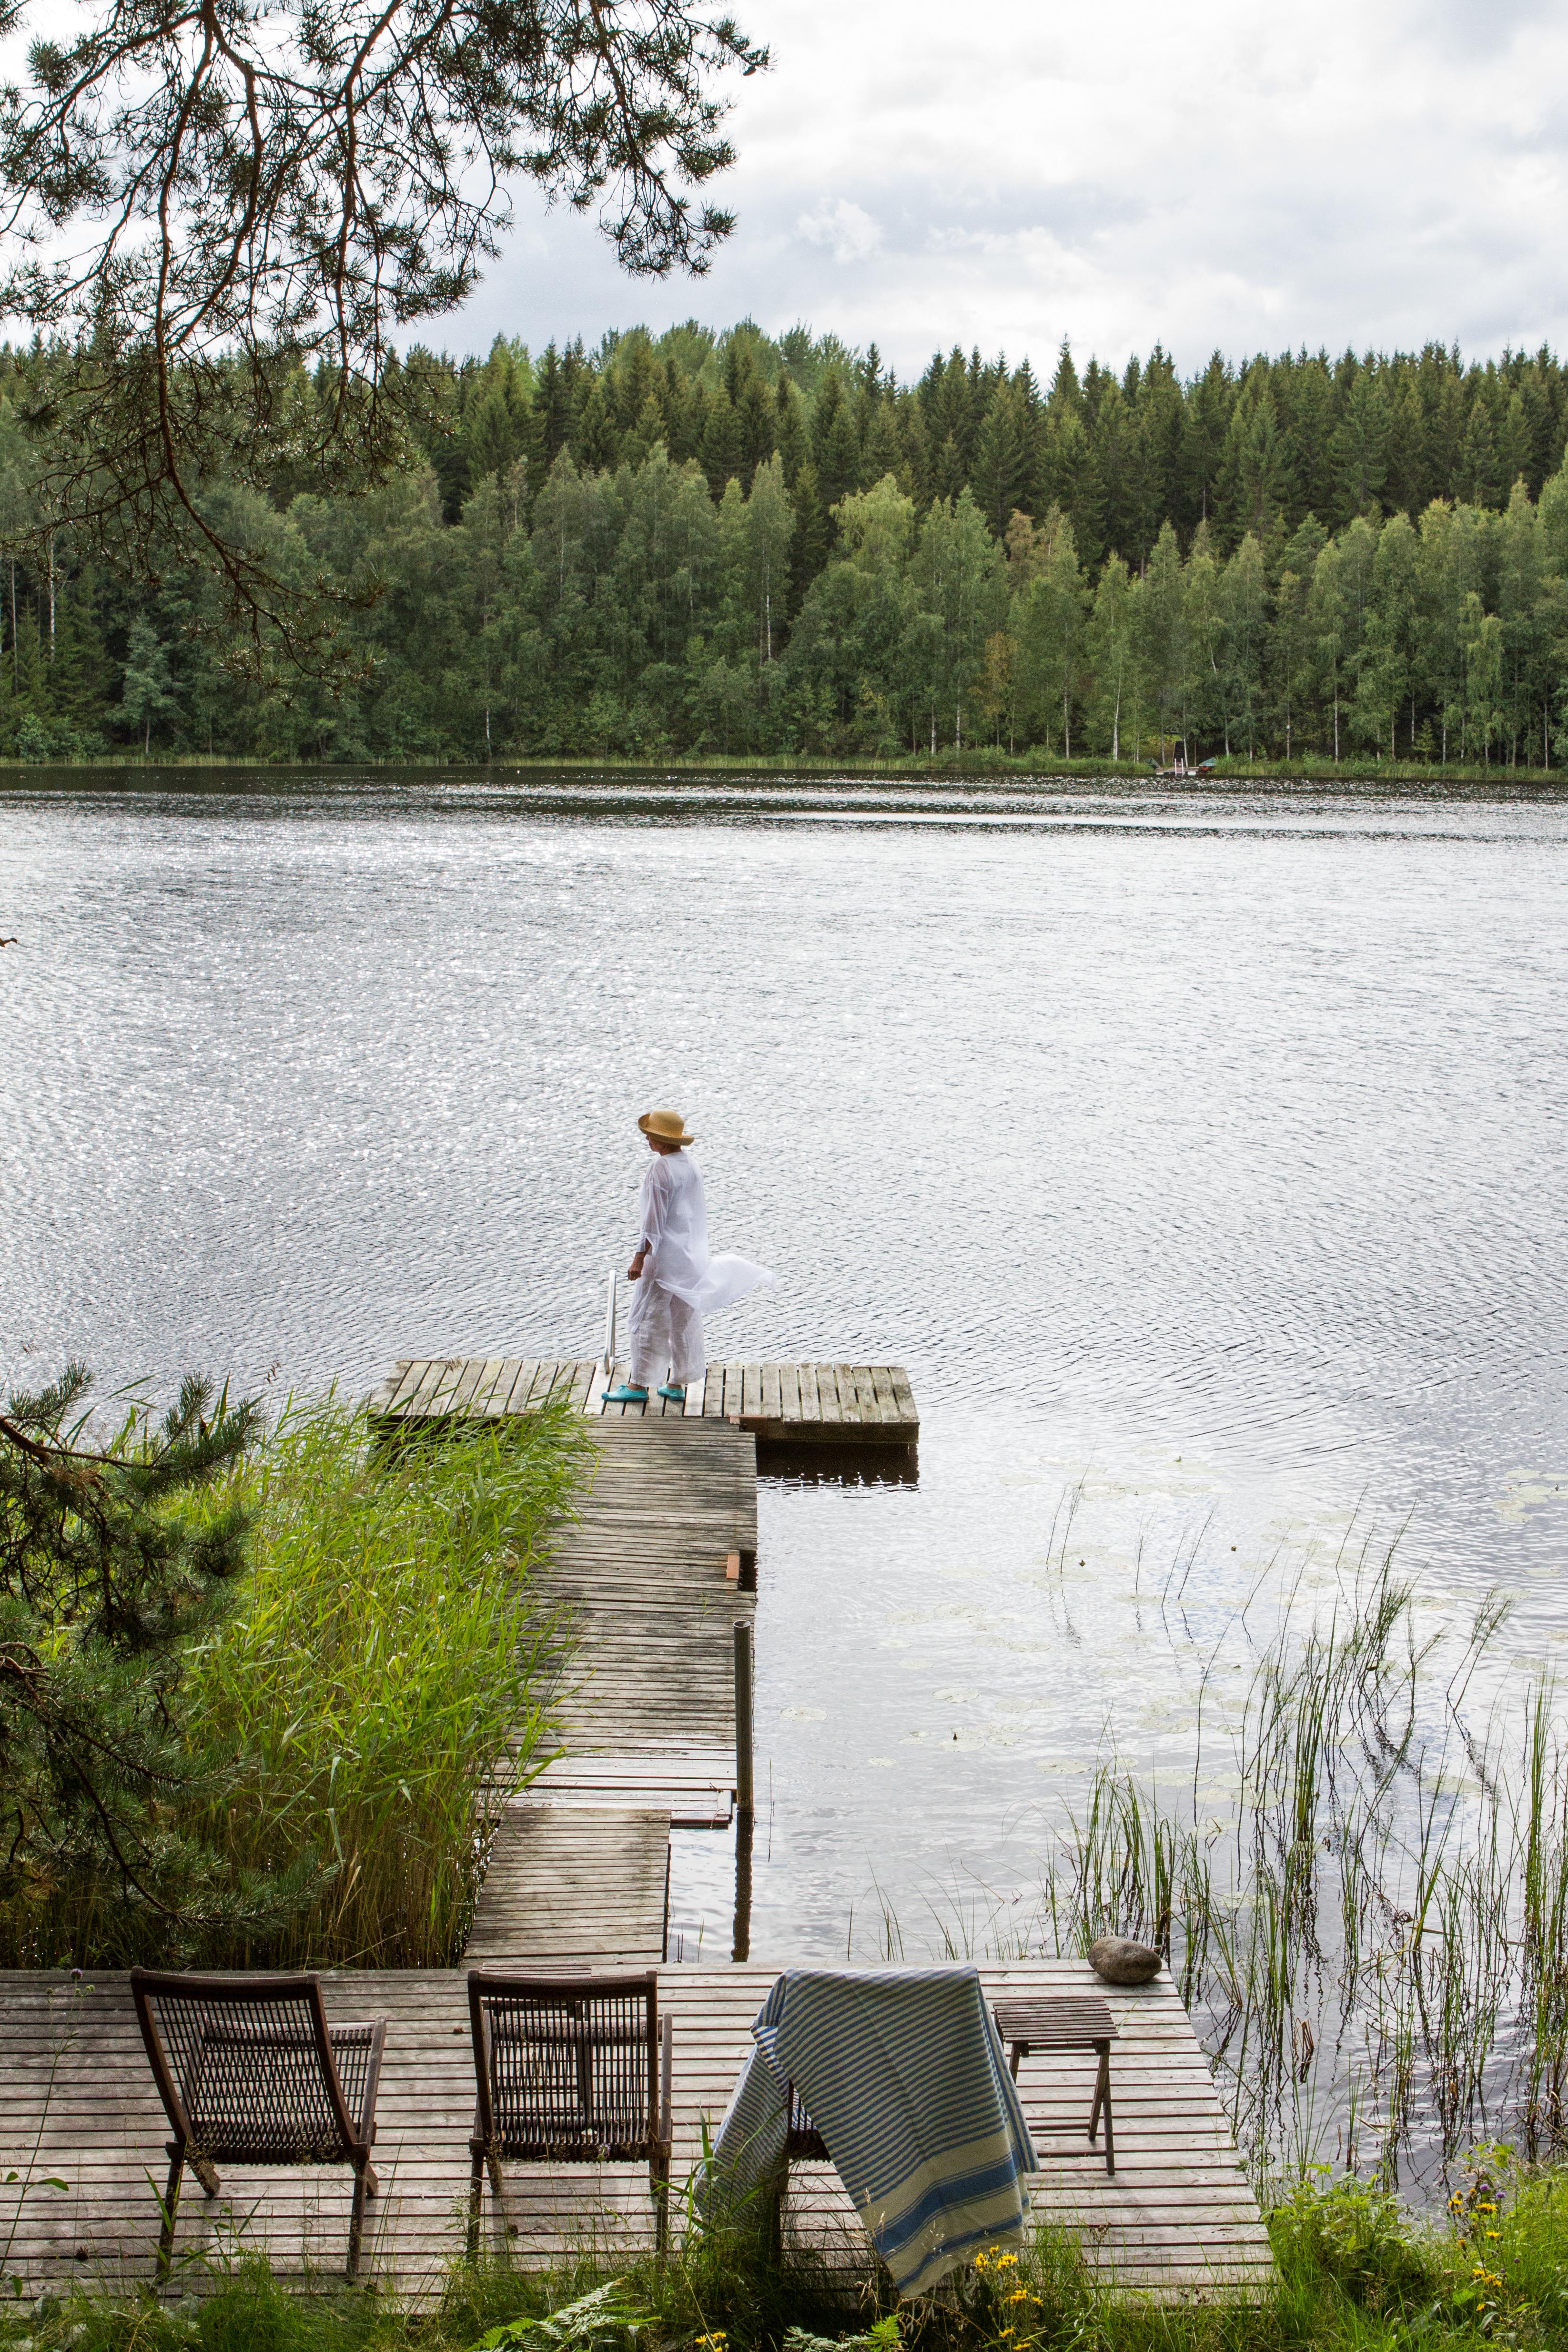 Ilona Pelli for Koti ja Keittiö